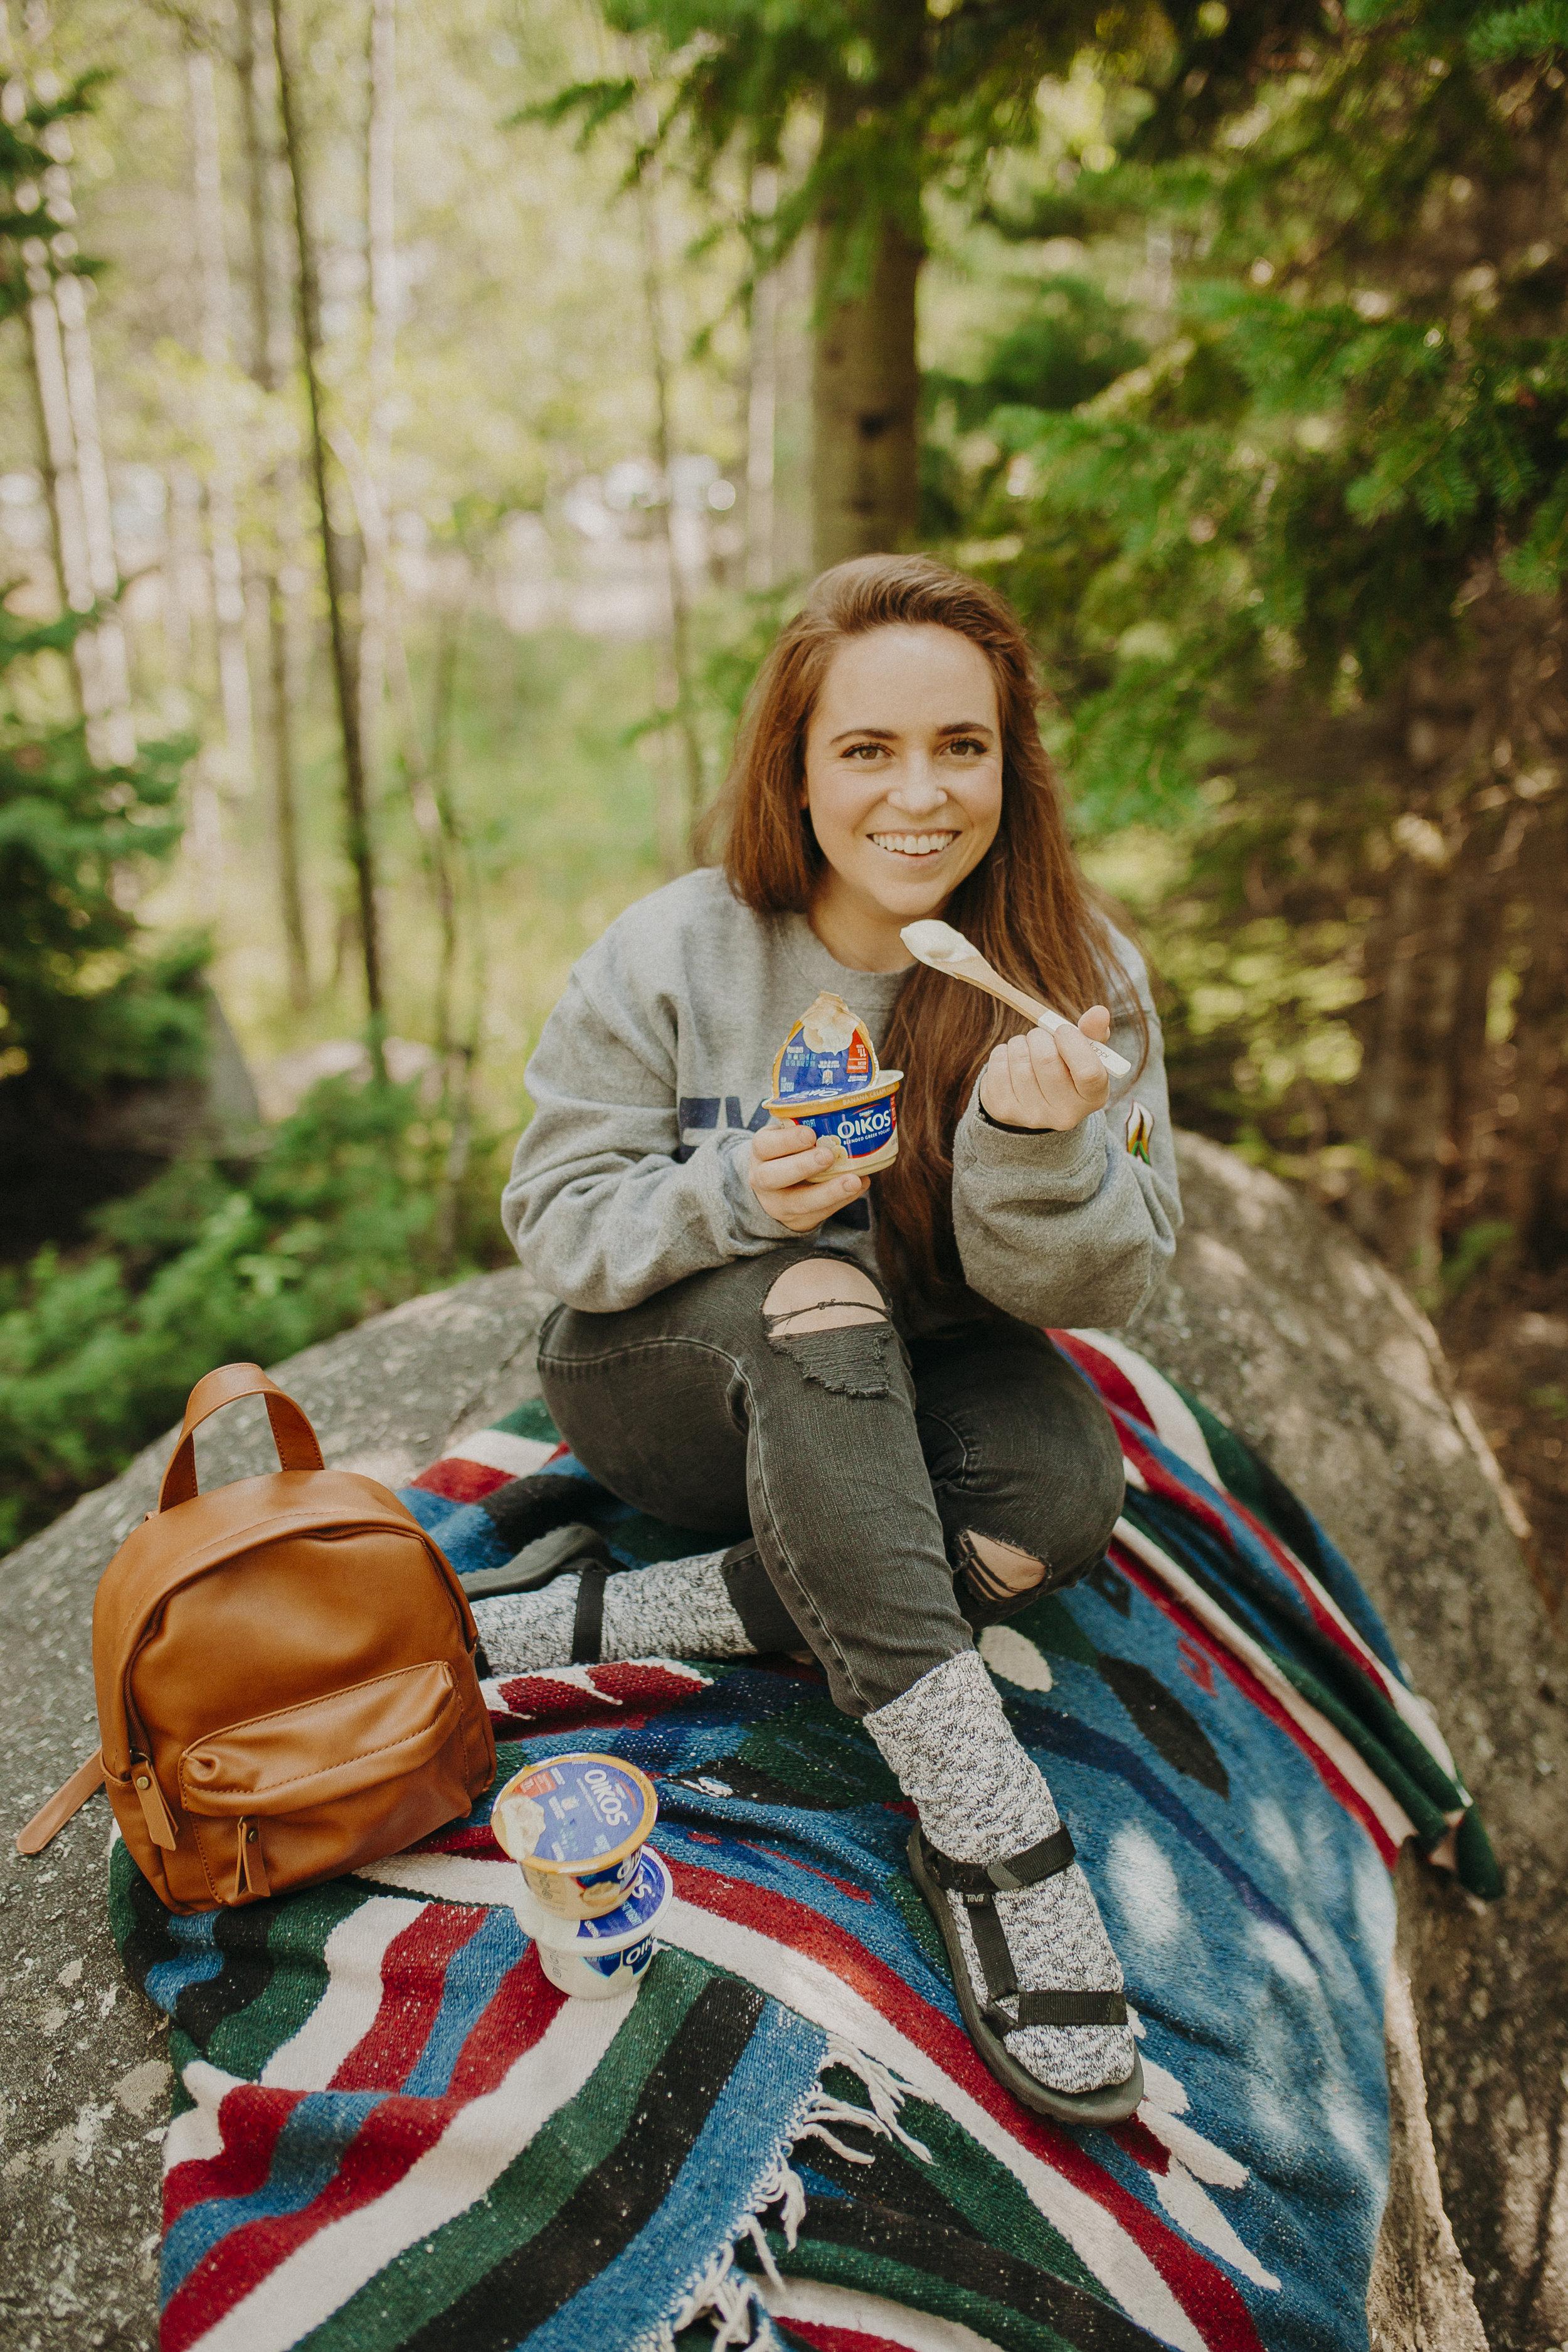 oikos-greek-yogurt-camping-breakfast-ideas-15.jpg